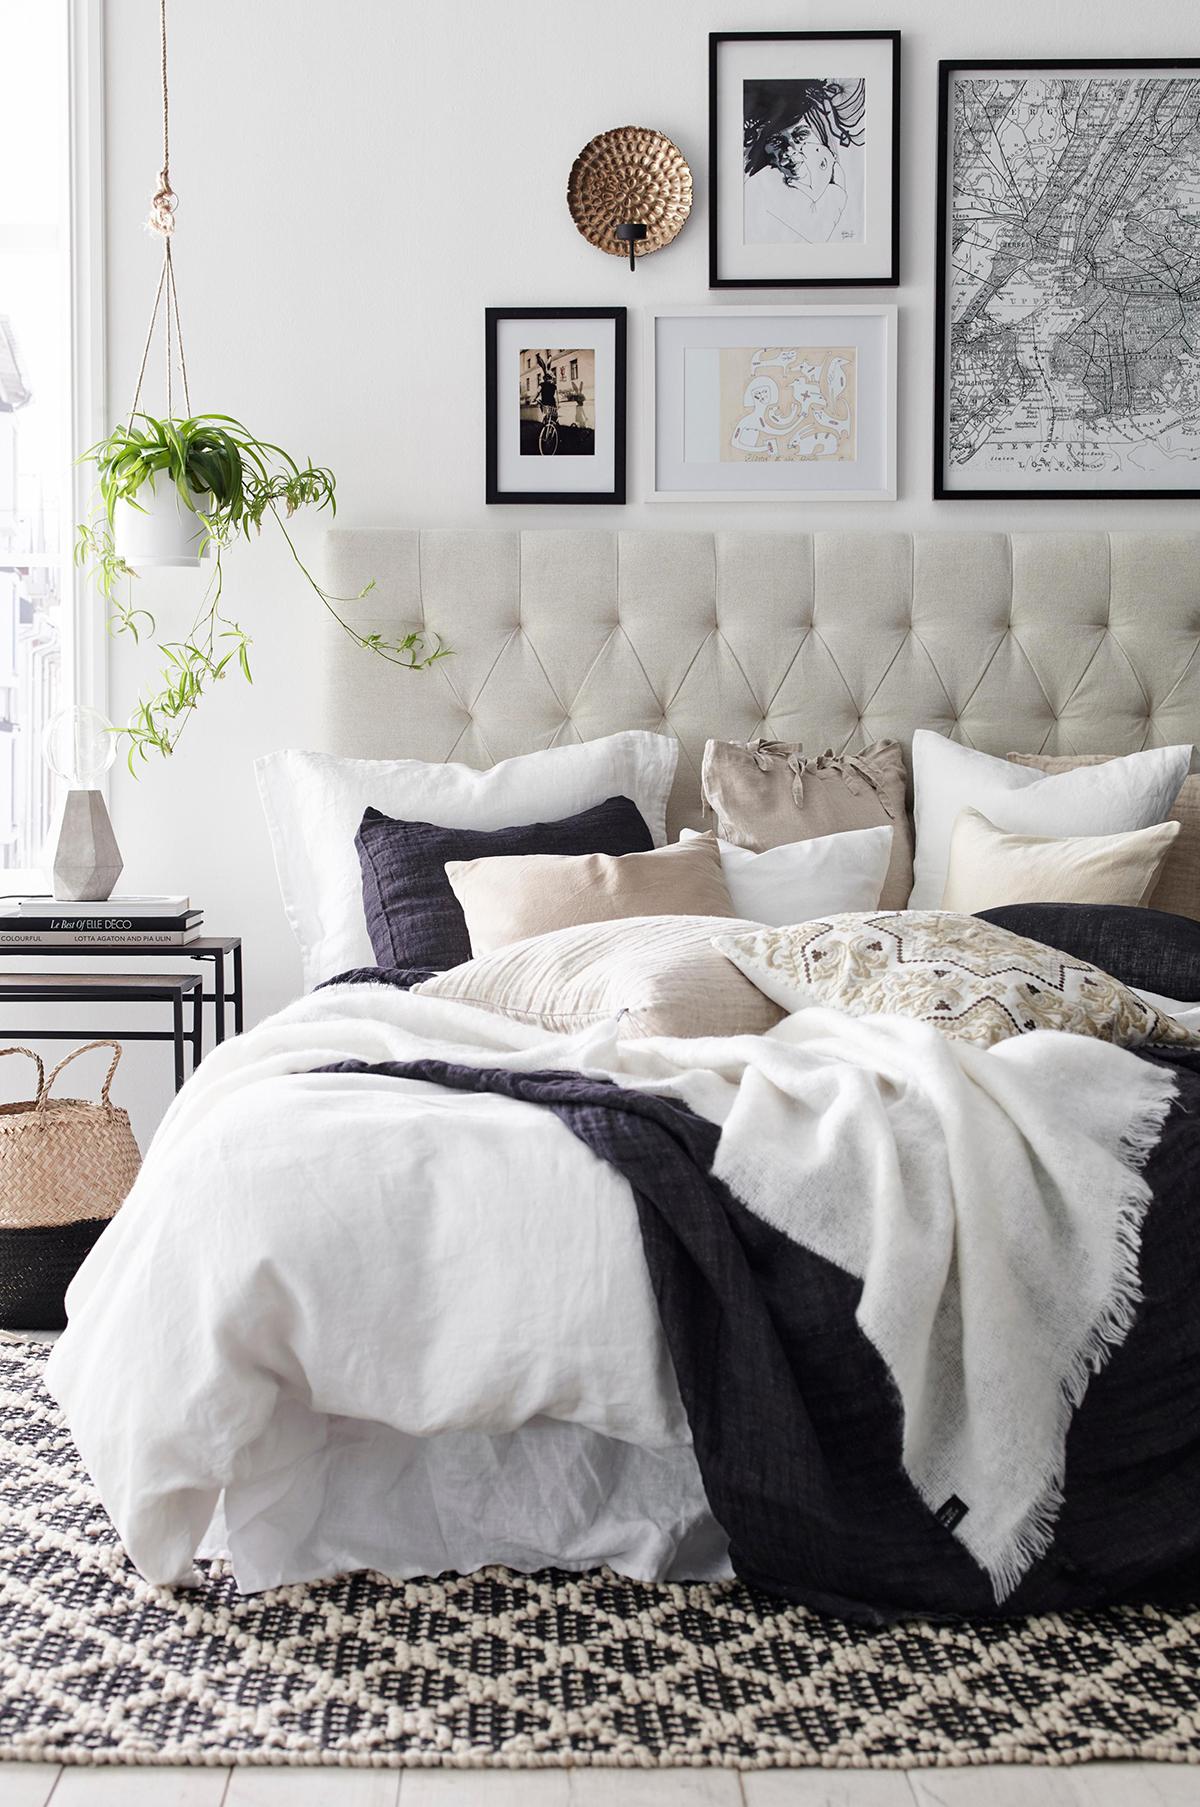 White & Black Bedroom Ideas